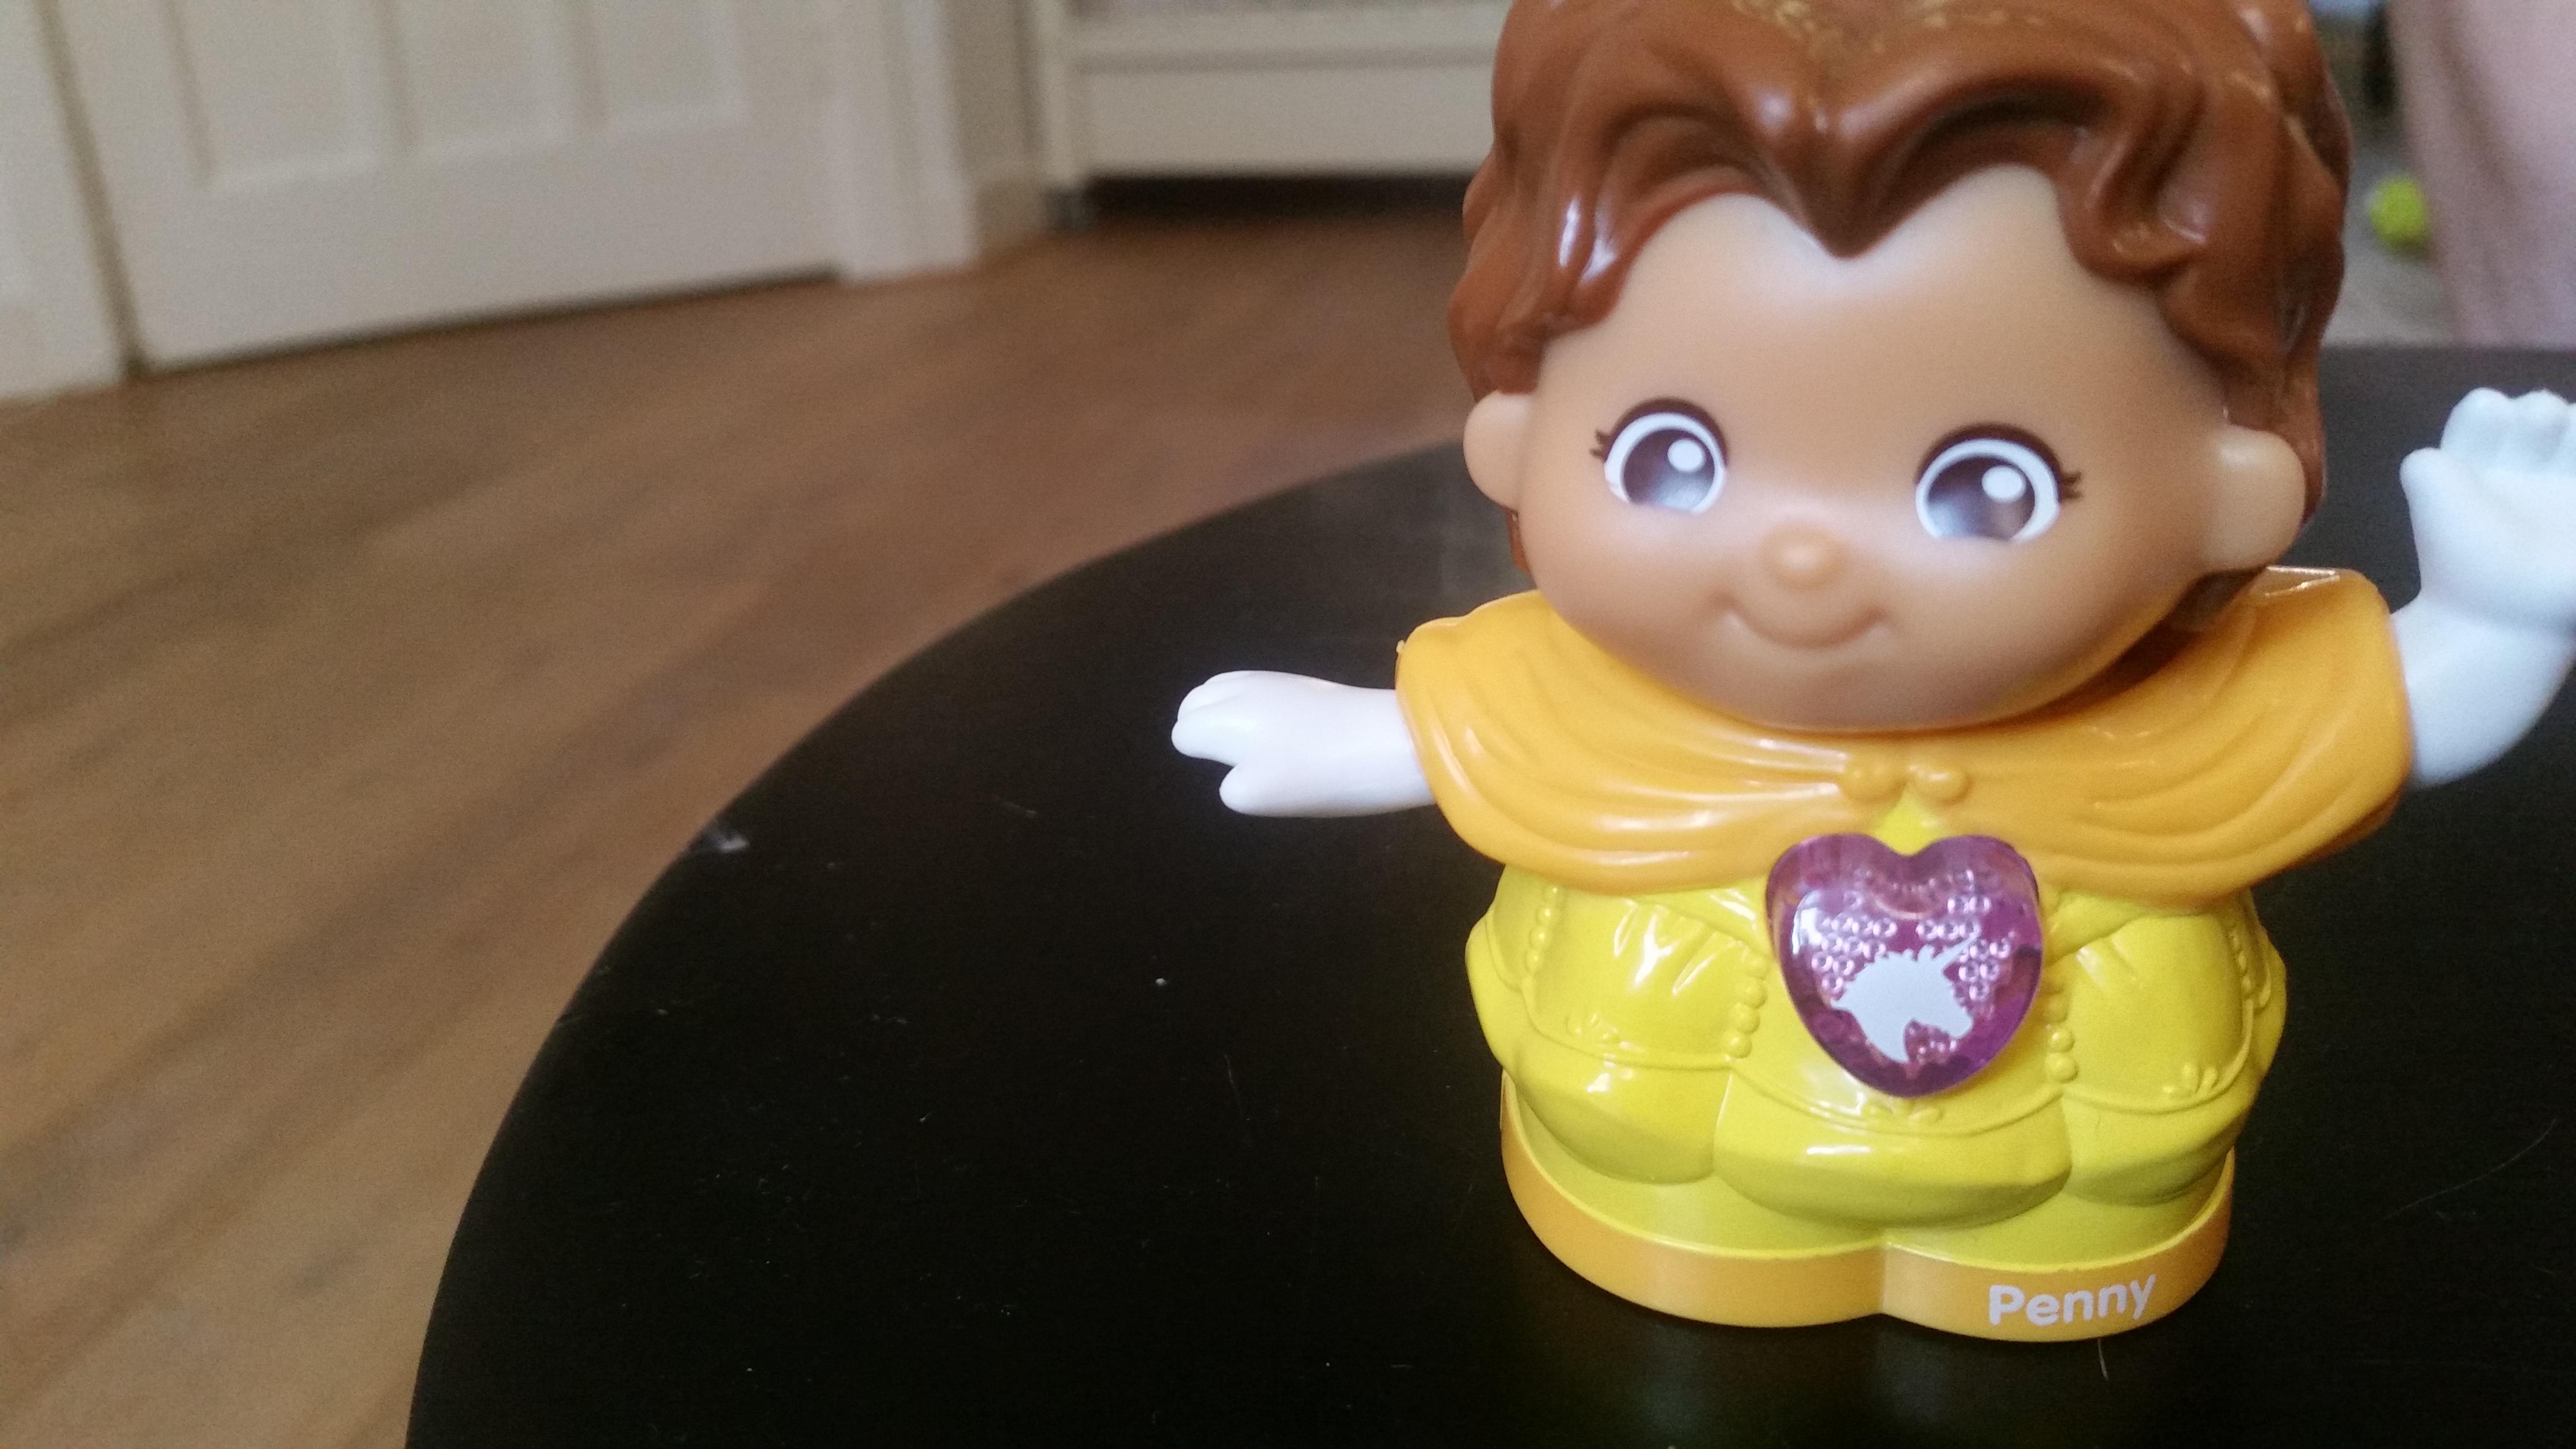 5-15-prinses-penny-eenhoorn-vtech-vrolijke-vriendjes-film-cadeau-verrassing-sint-kerst-liedjes-magische-wereld-mama-nanny-amsterdam-prinses